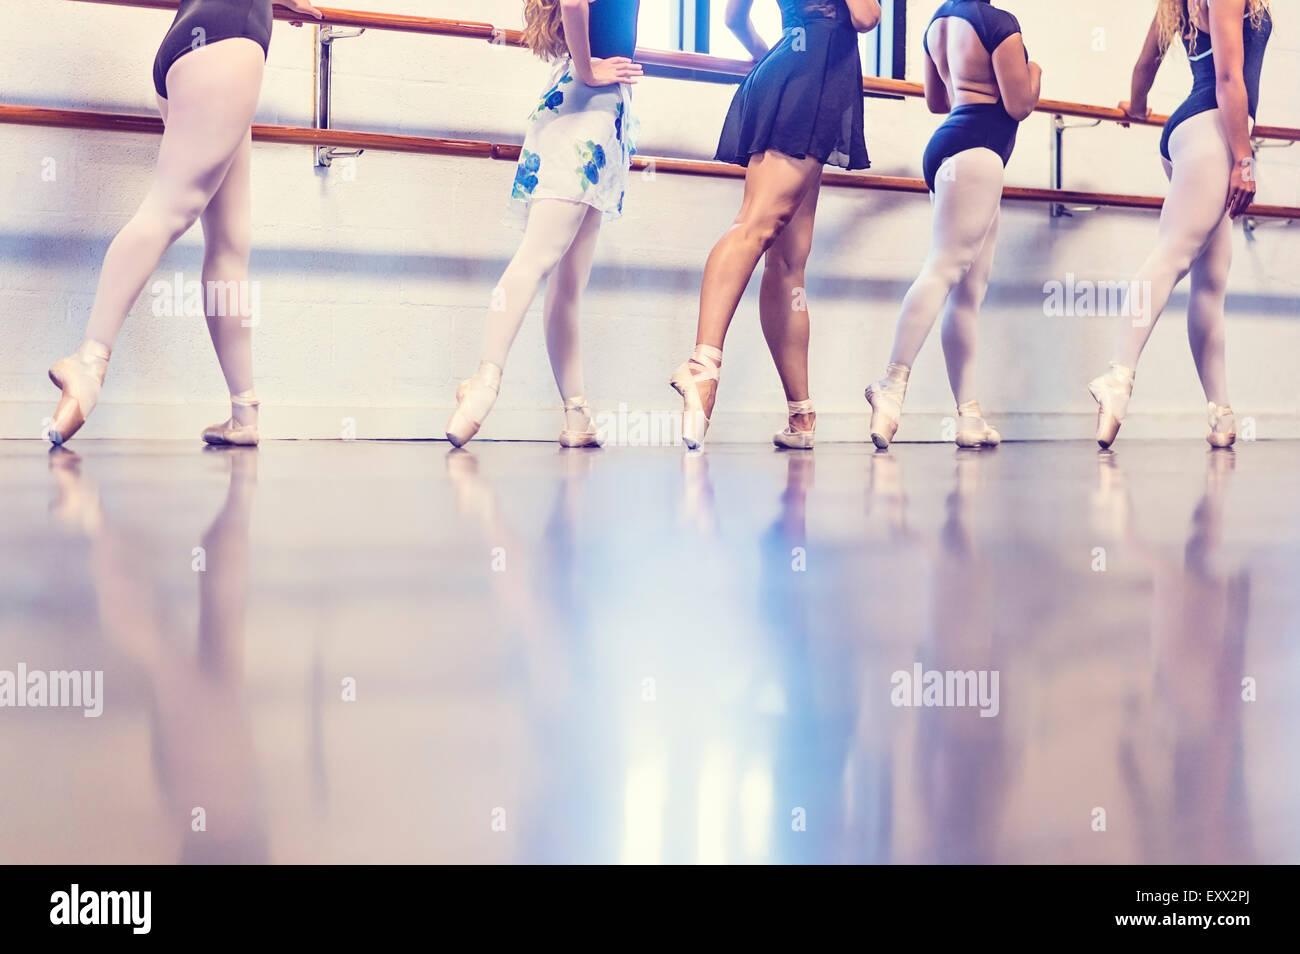 Junge Frauen tanzen im Tanzstudio Stockbild